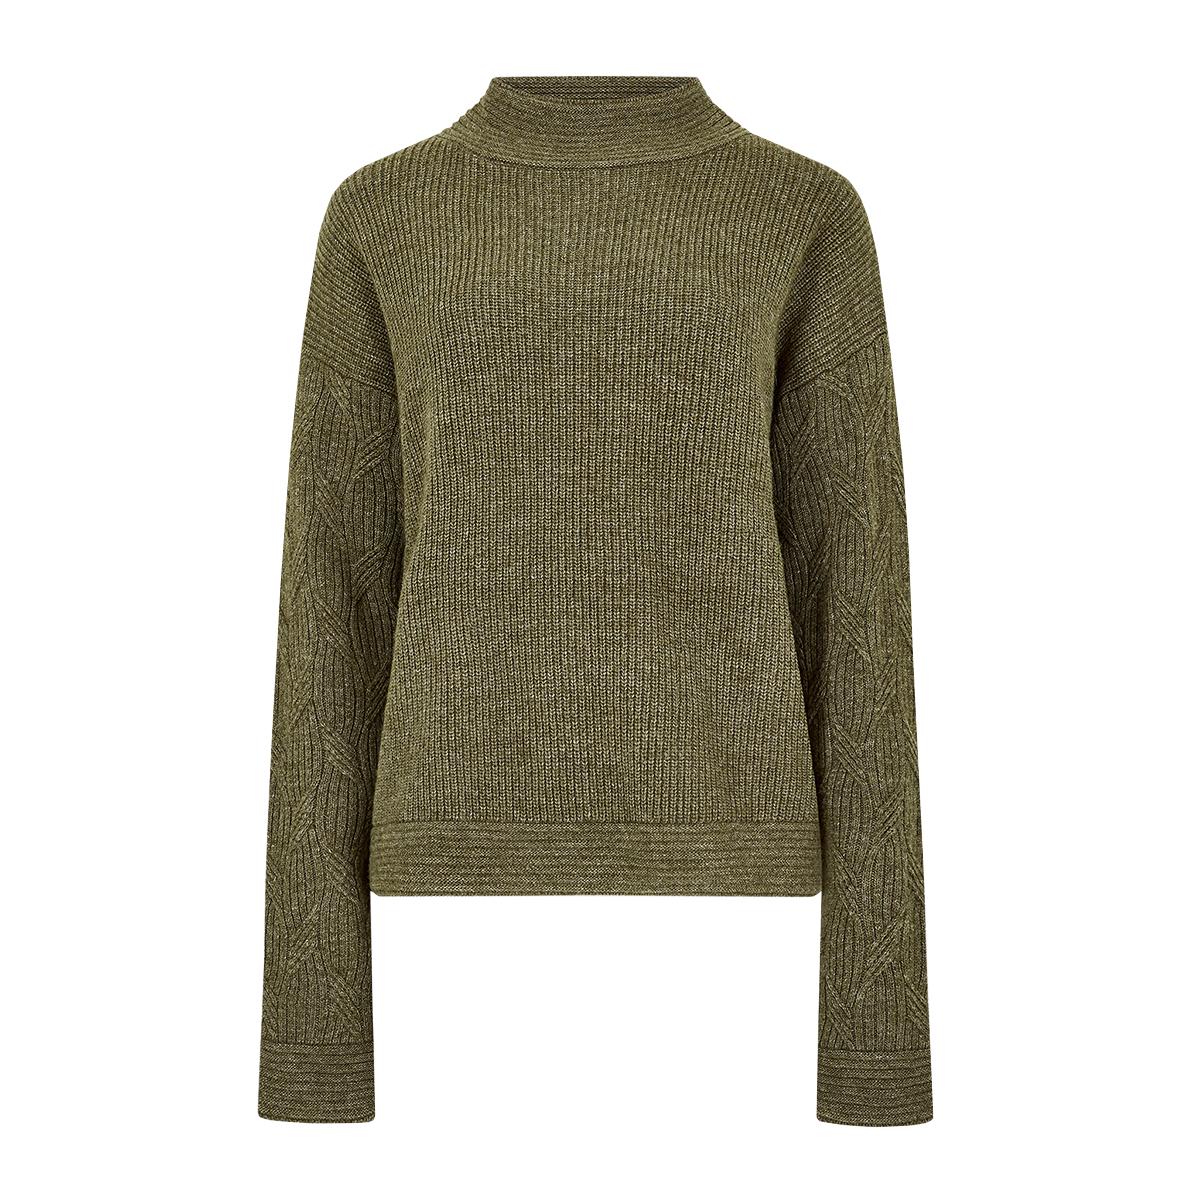 Dubarry-Byrne-Loose-Fit-Sweater-Dusky-Green